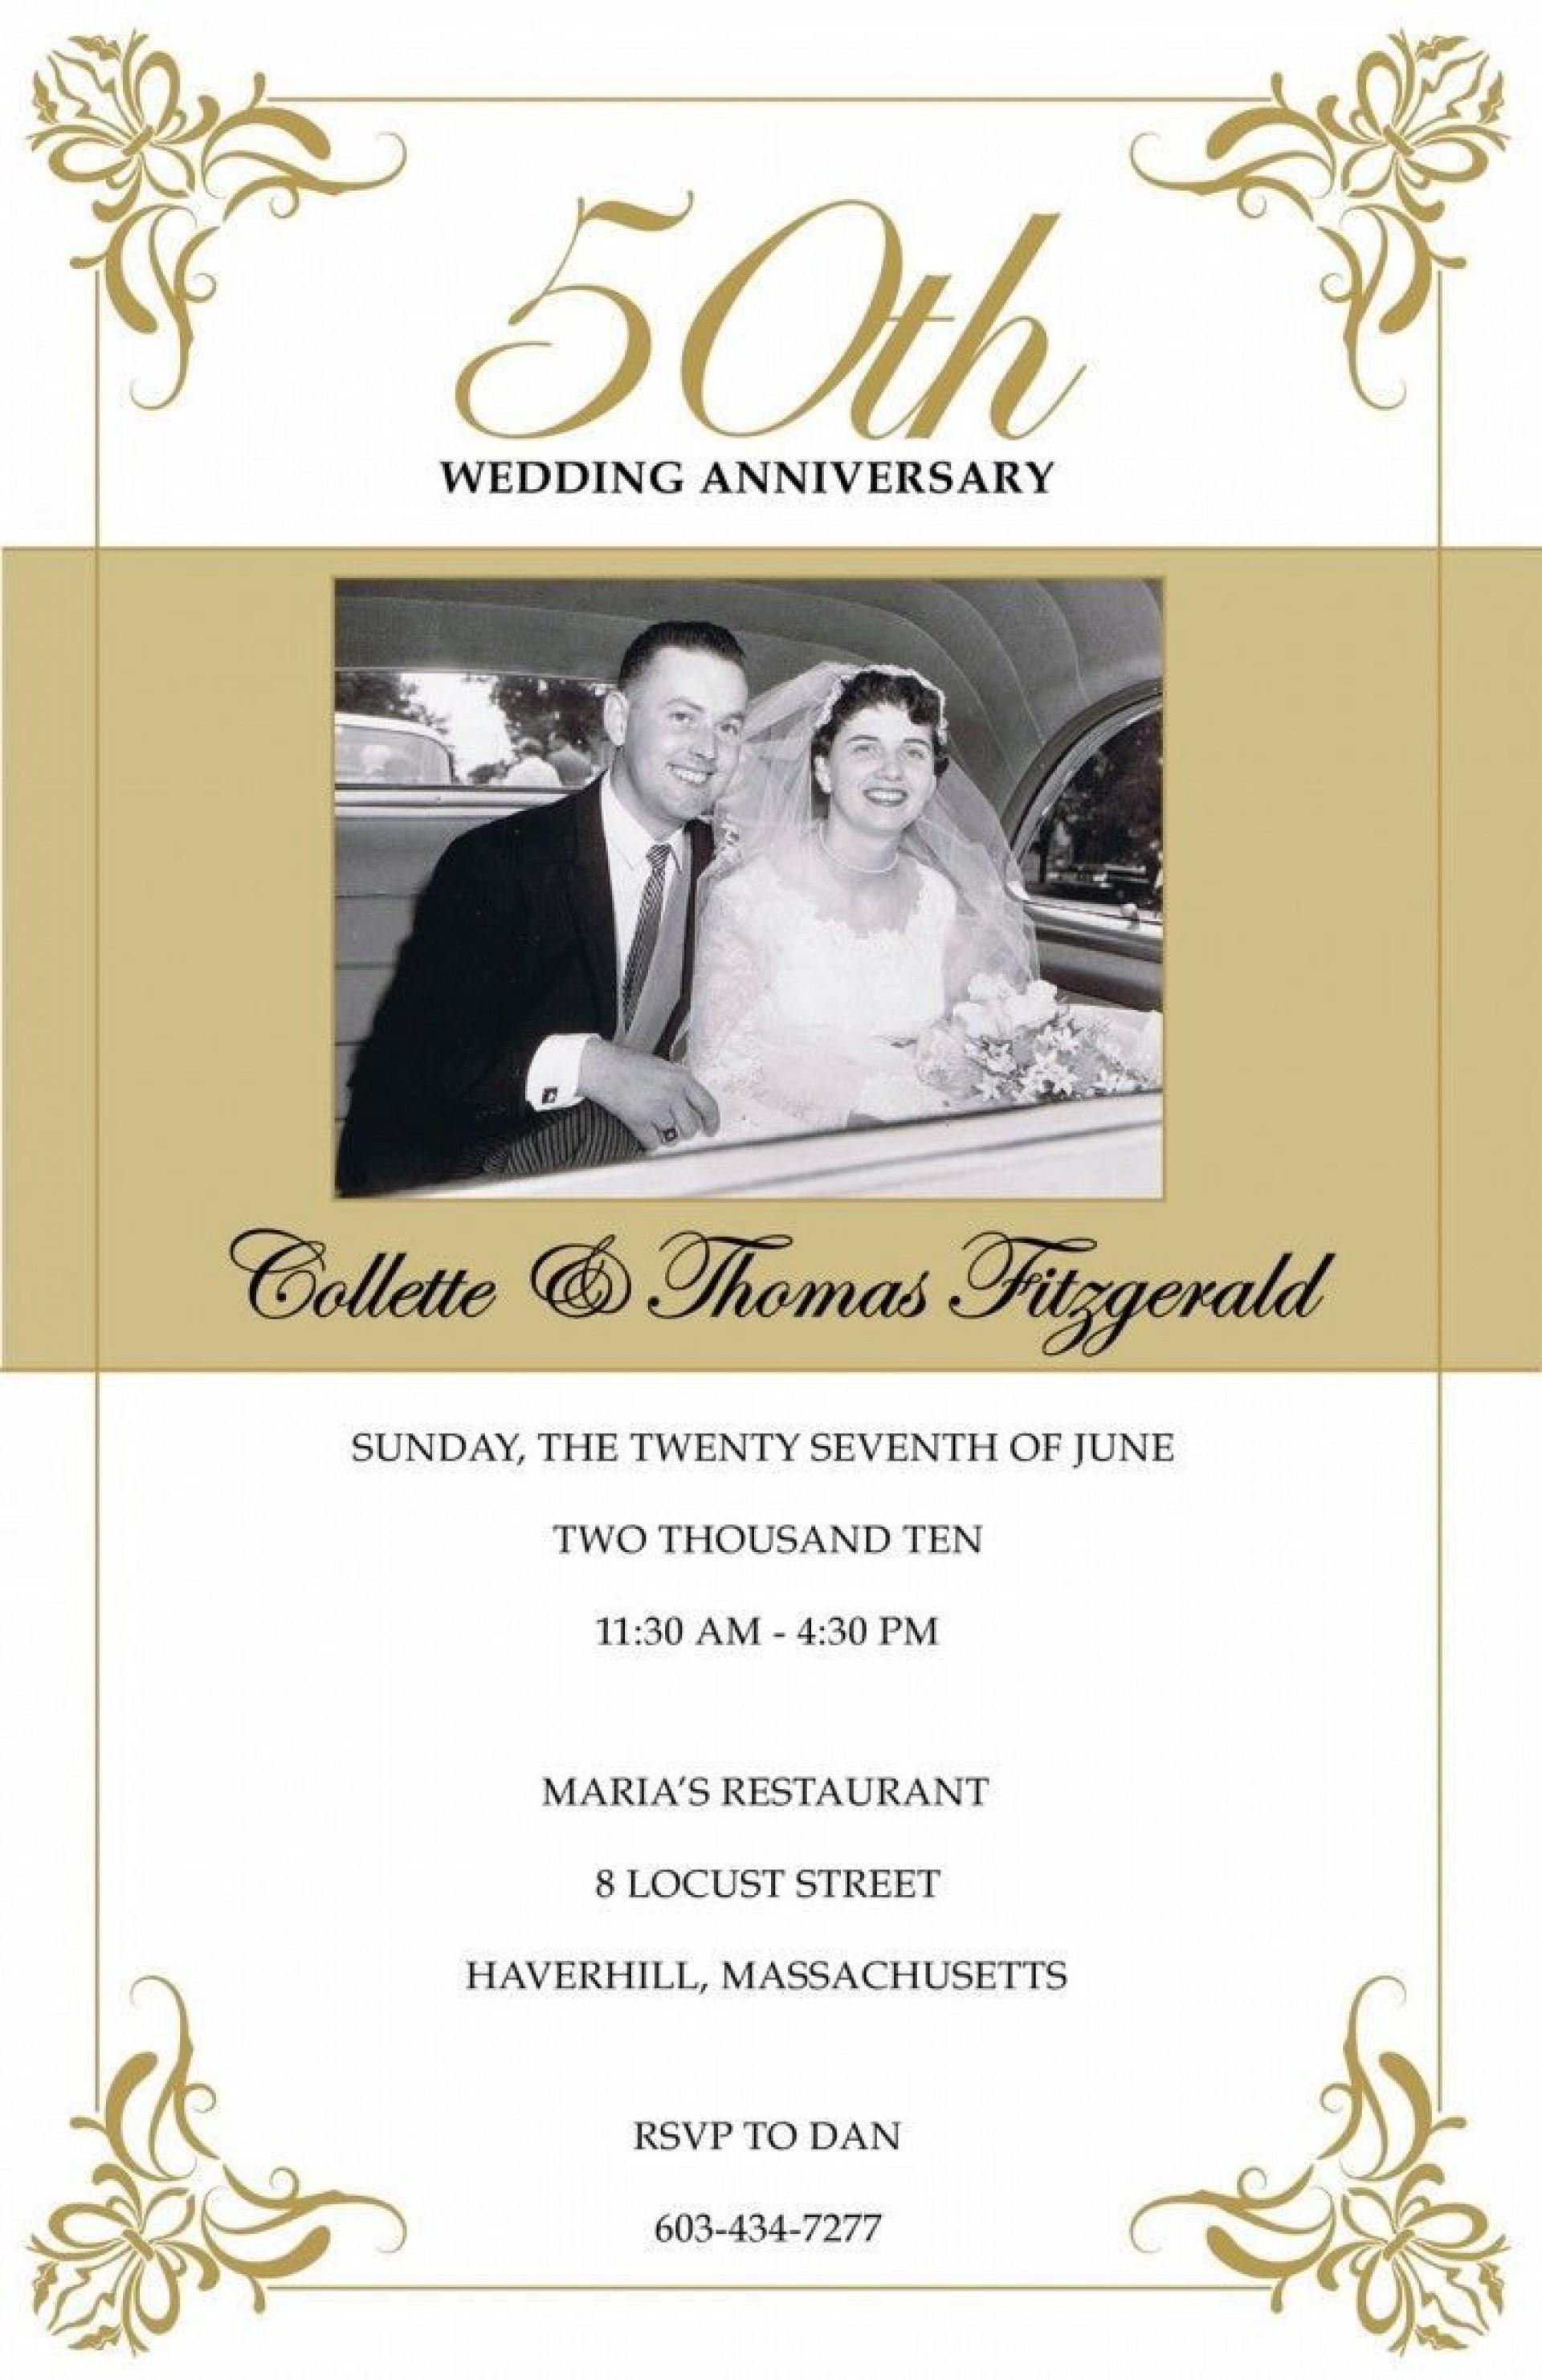 009 Breathtaking 50th Anniversary Invitation Template High Resolution  Wedding Microsoft Word Free Download1920